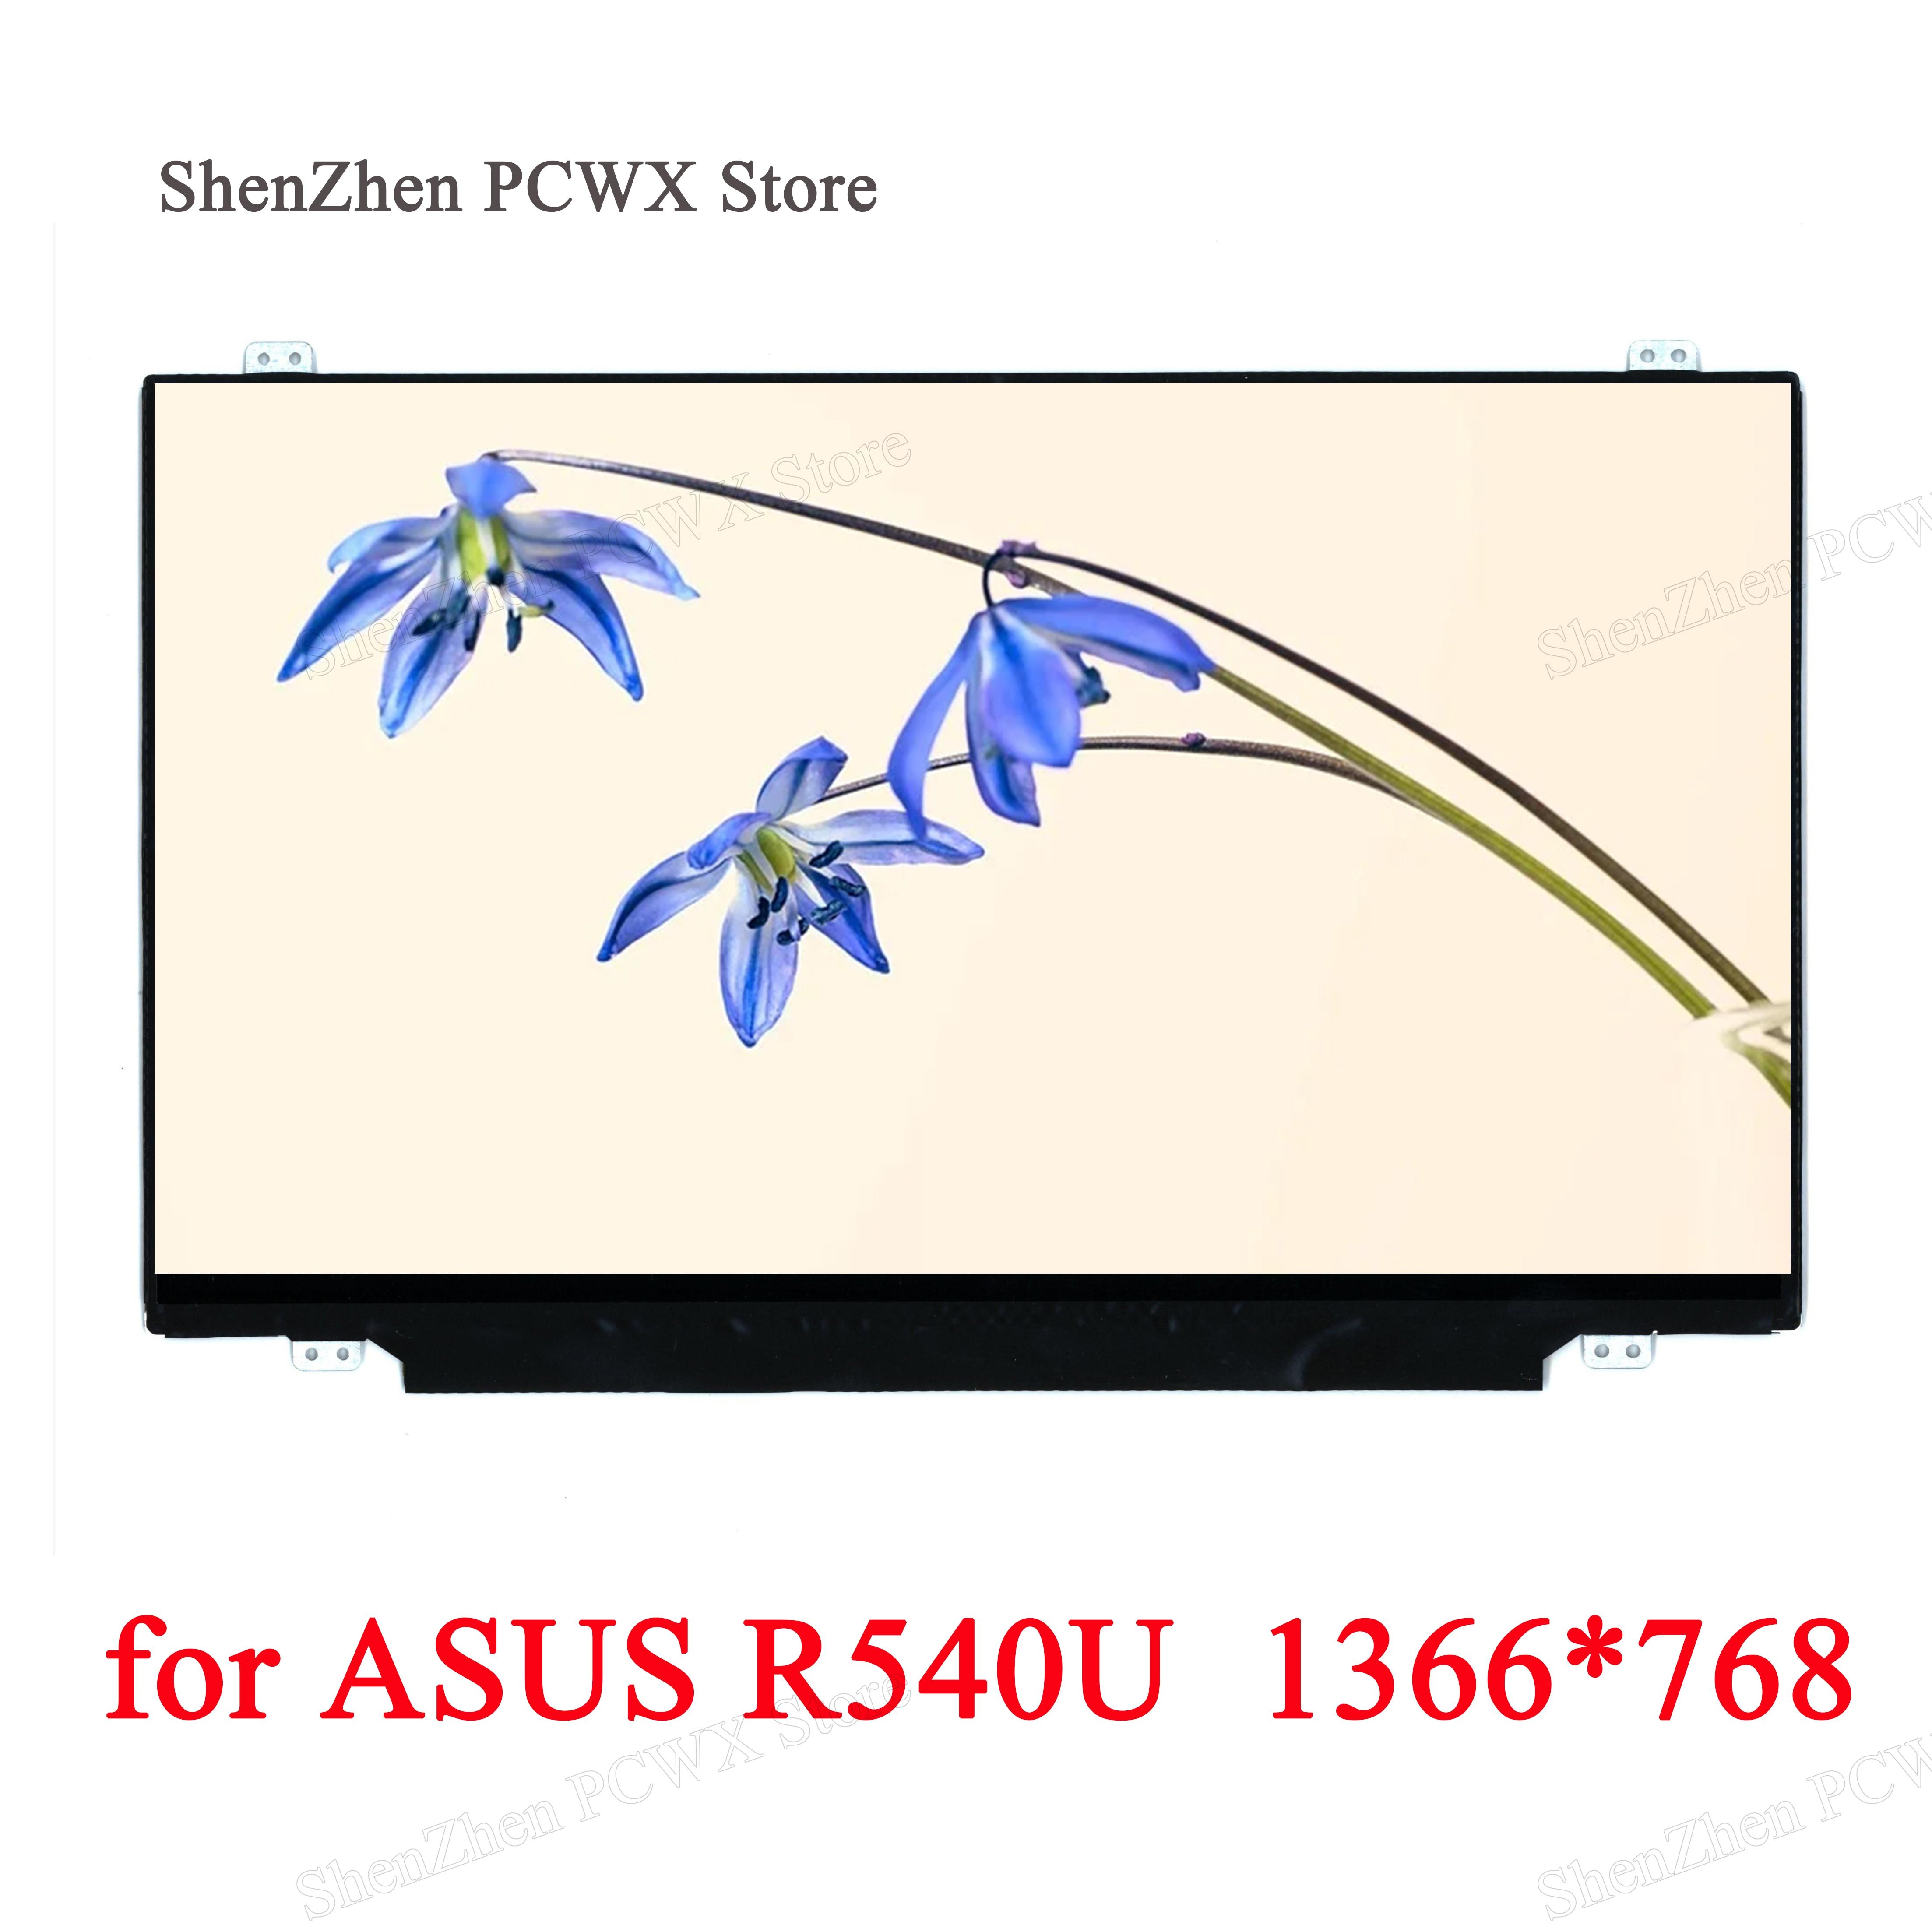 Para ASUS R540U 1366*768 HD LCD LED 15,6 Notebook eDP 30 pines matriz brillante 45% NTSC 60Hz para Innolux AUO LG BOE de nuevo